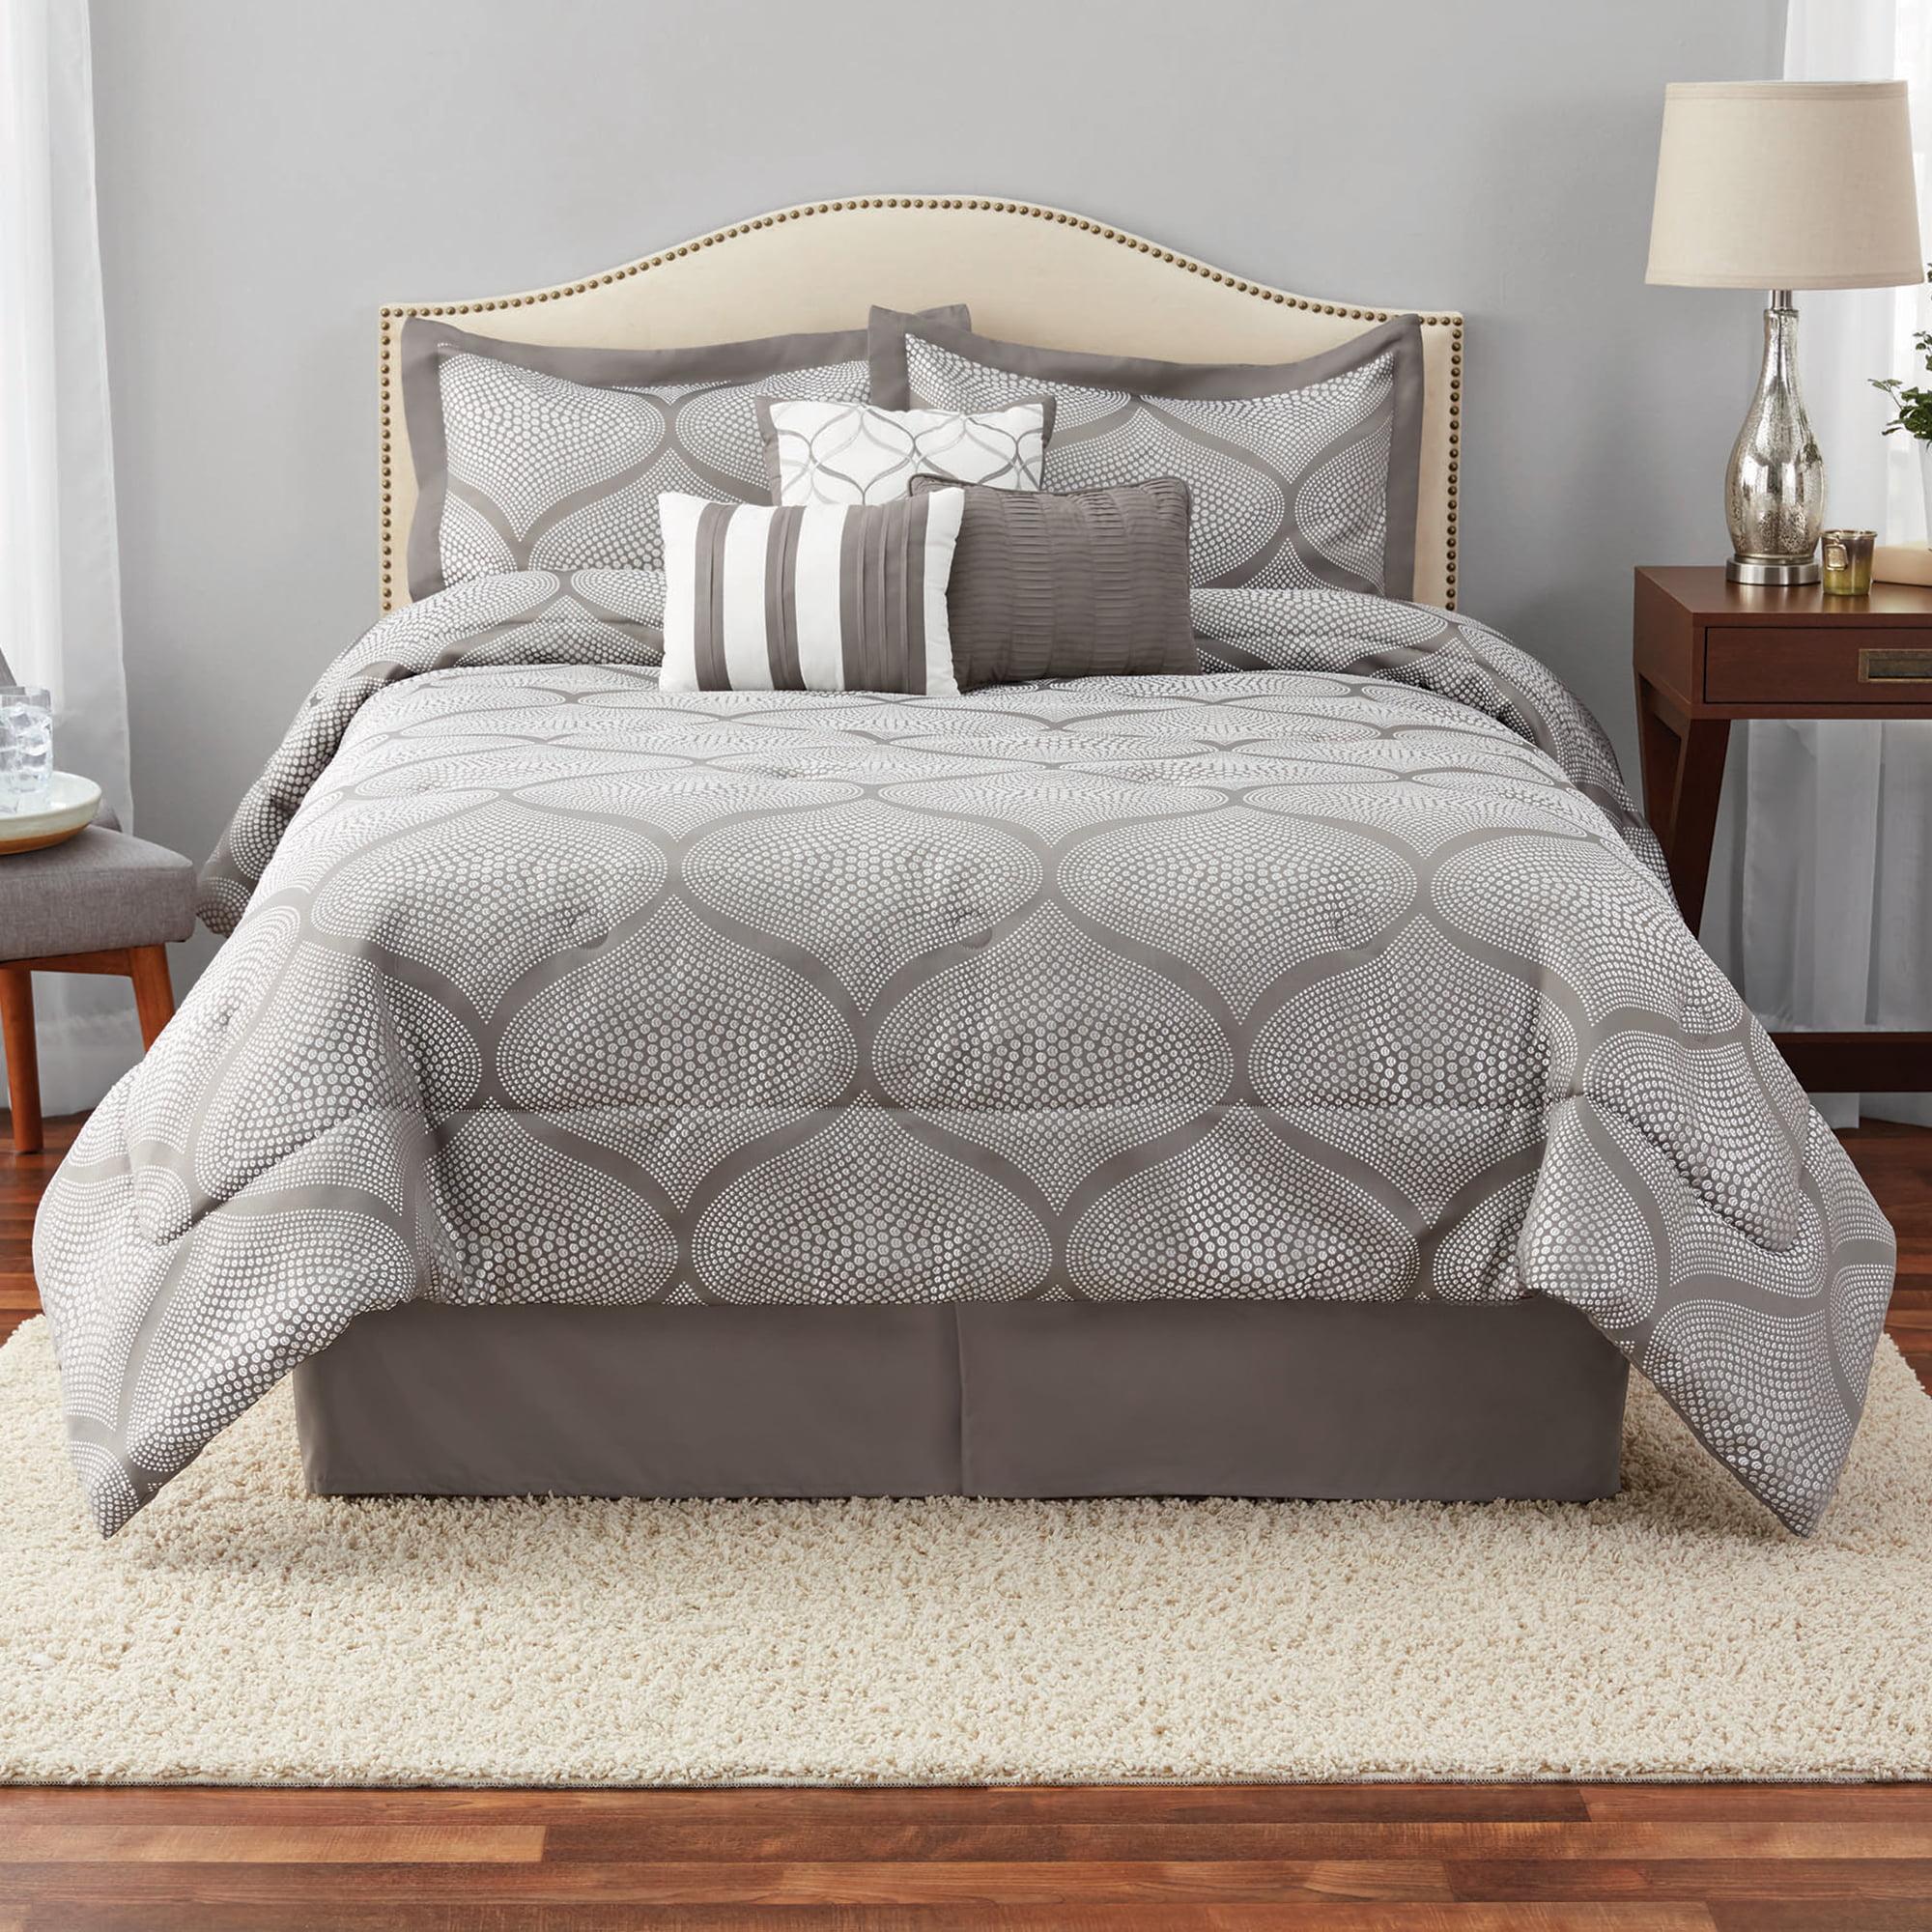 Mainstays Damask 7 Piece Comforter Set with Bedskirt by E & E CO LTD